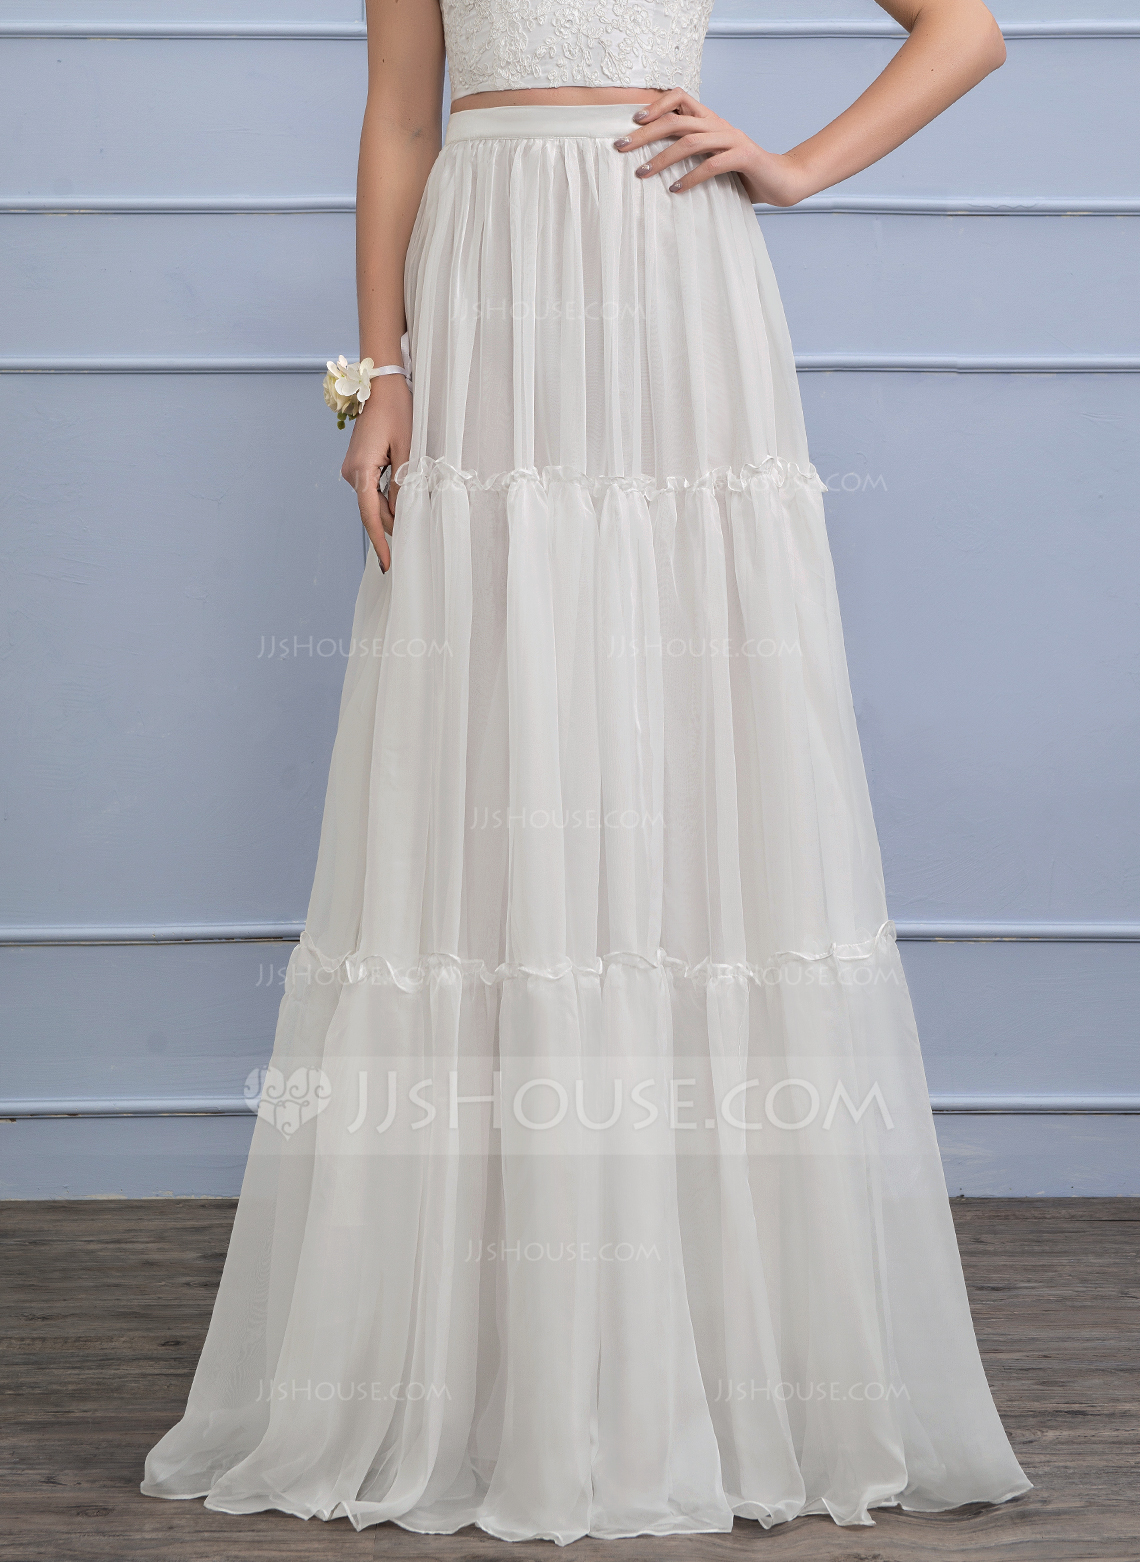 Separates FloorLength Chiffon Wedding Skirt 002110495